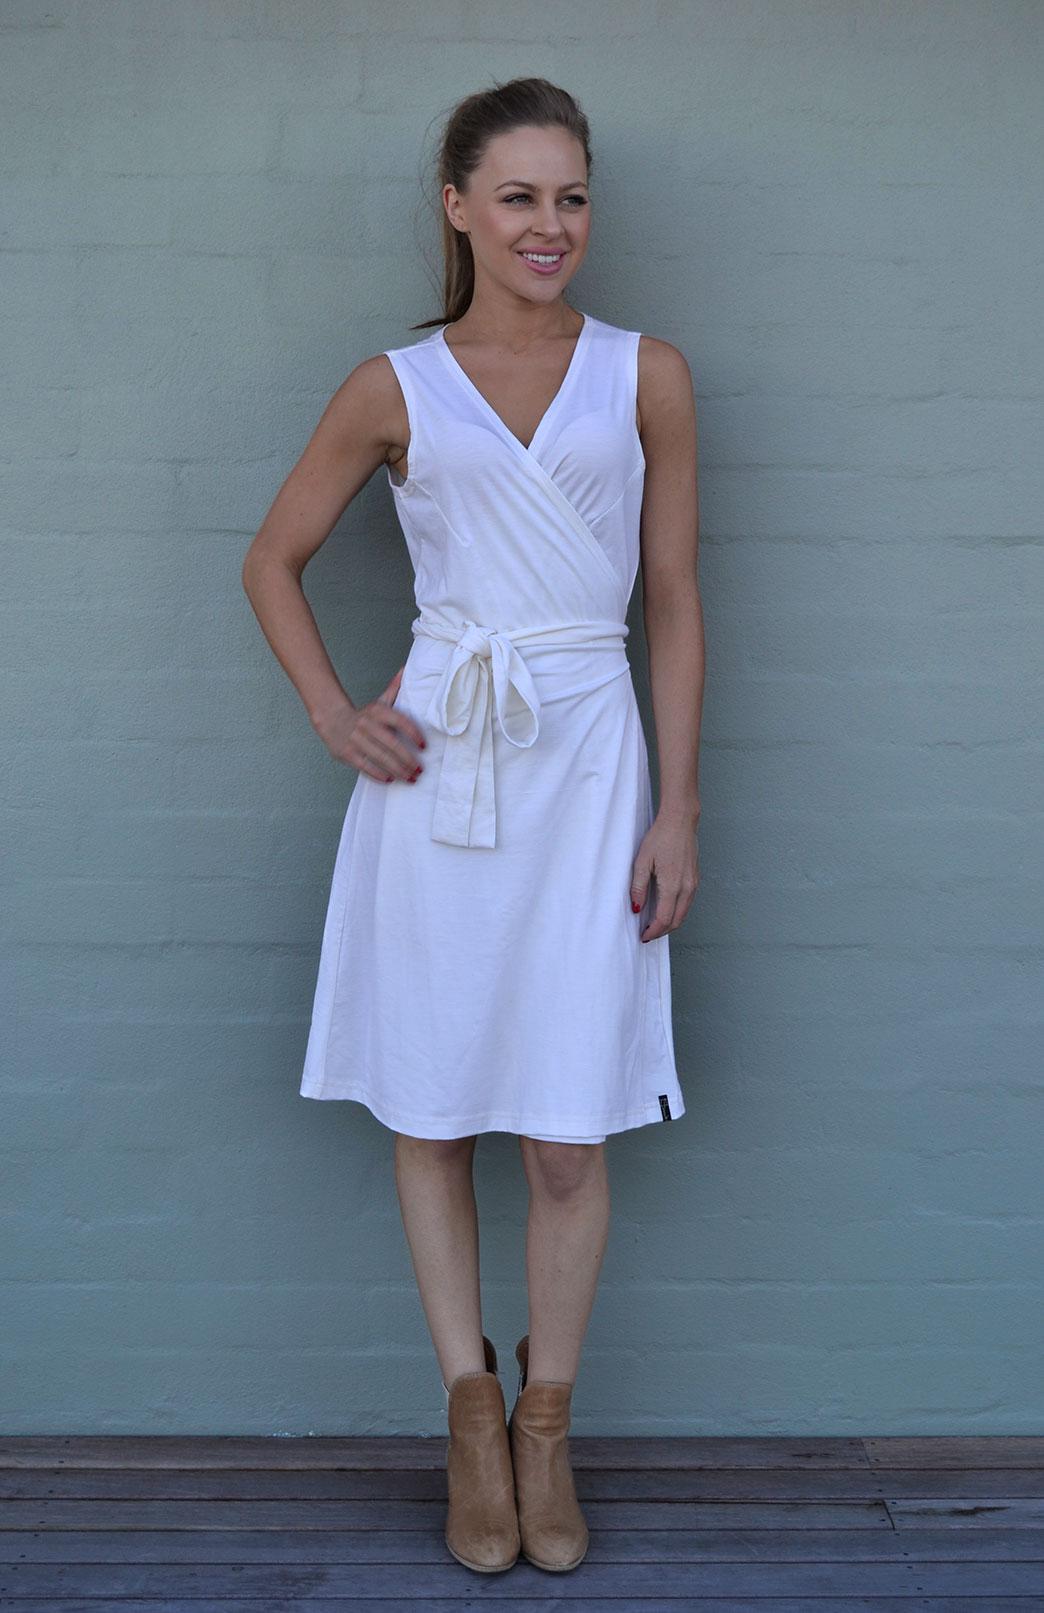 Wrap Dress - Sleeveless - Women's Ivory Merino Wool Sleeveless Wrap Dress with Ties - Smitten Merino Tasmania Australia